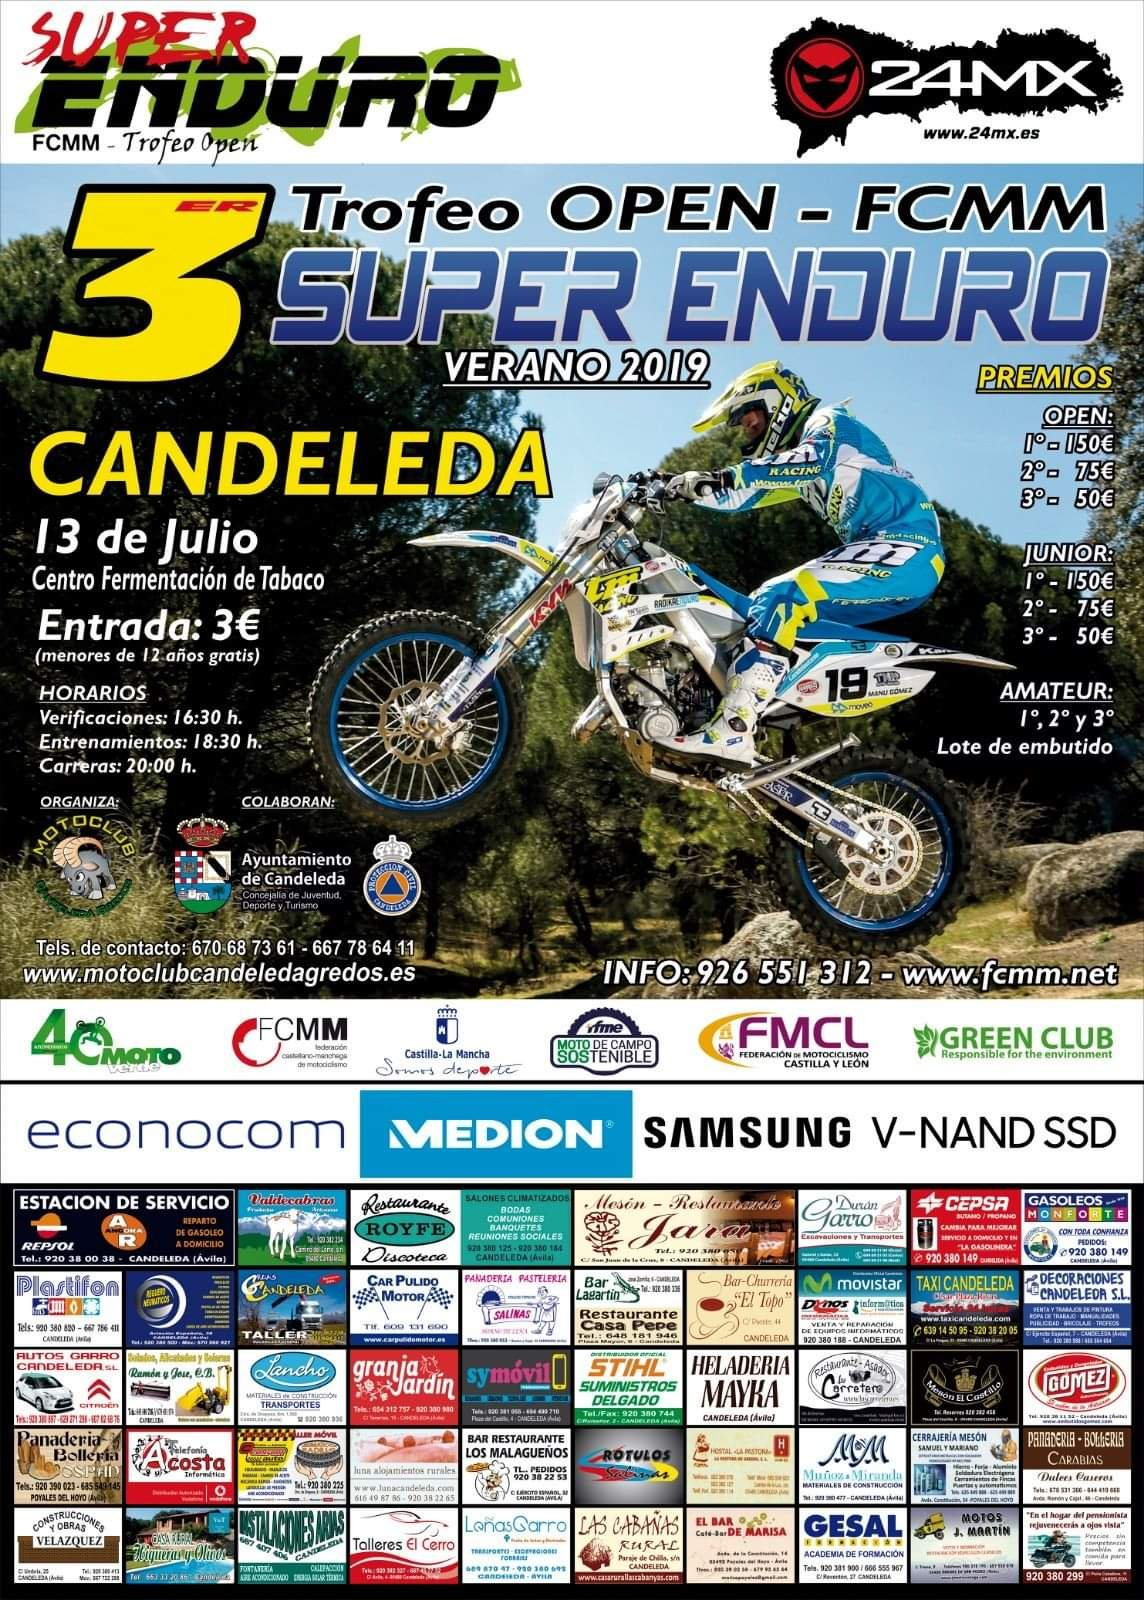 Super Enduro 2019 - Candeleda (Ávila)